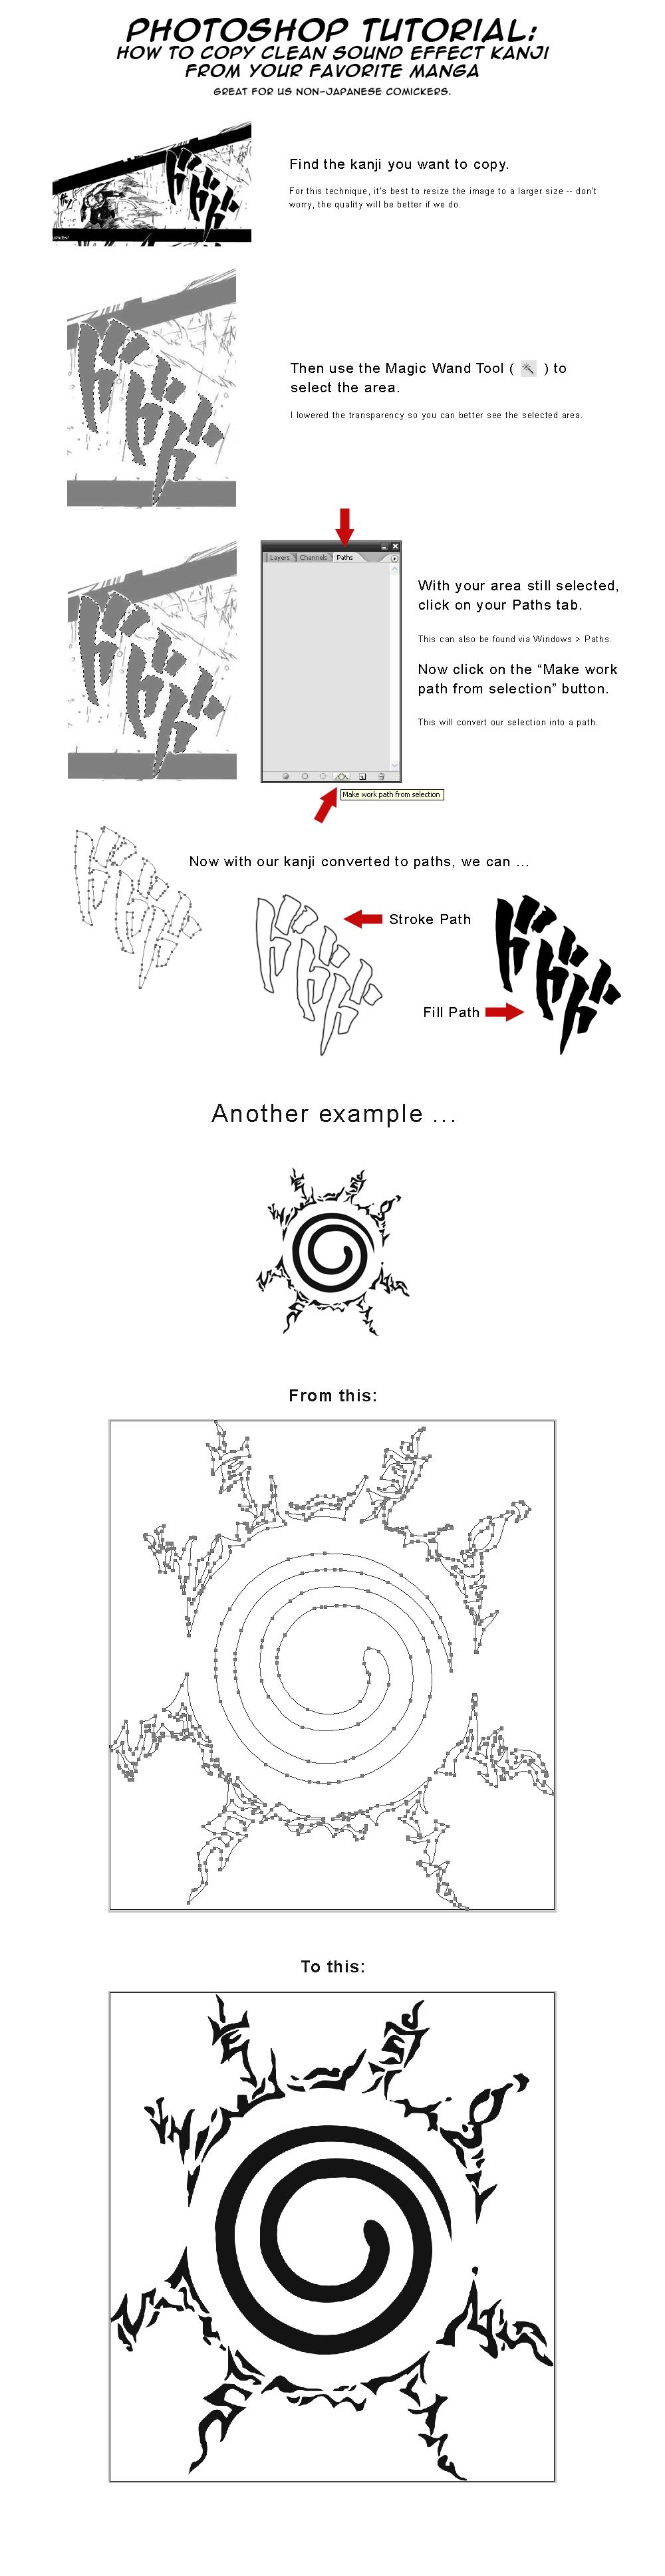 Tutorial: Clean SFX Kanjis by mongrelmarie